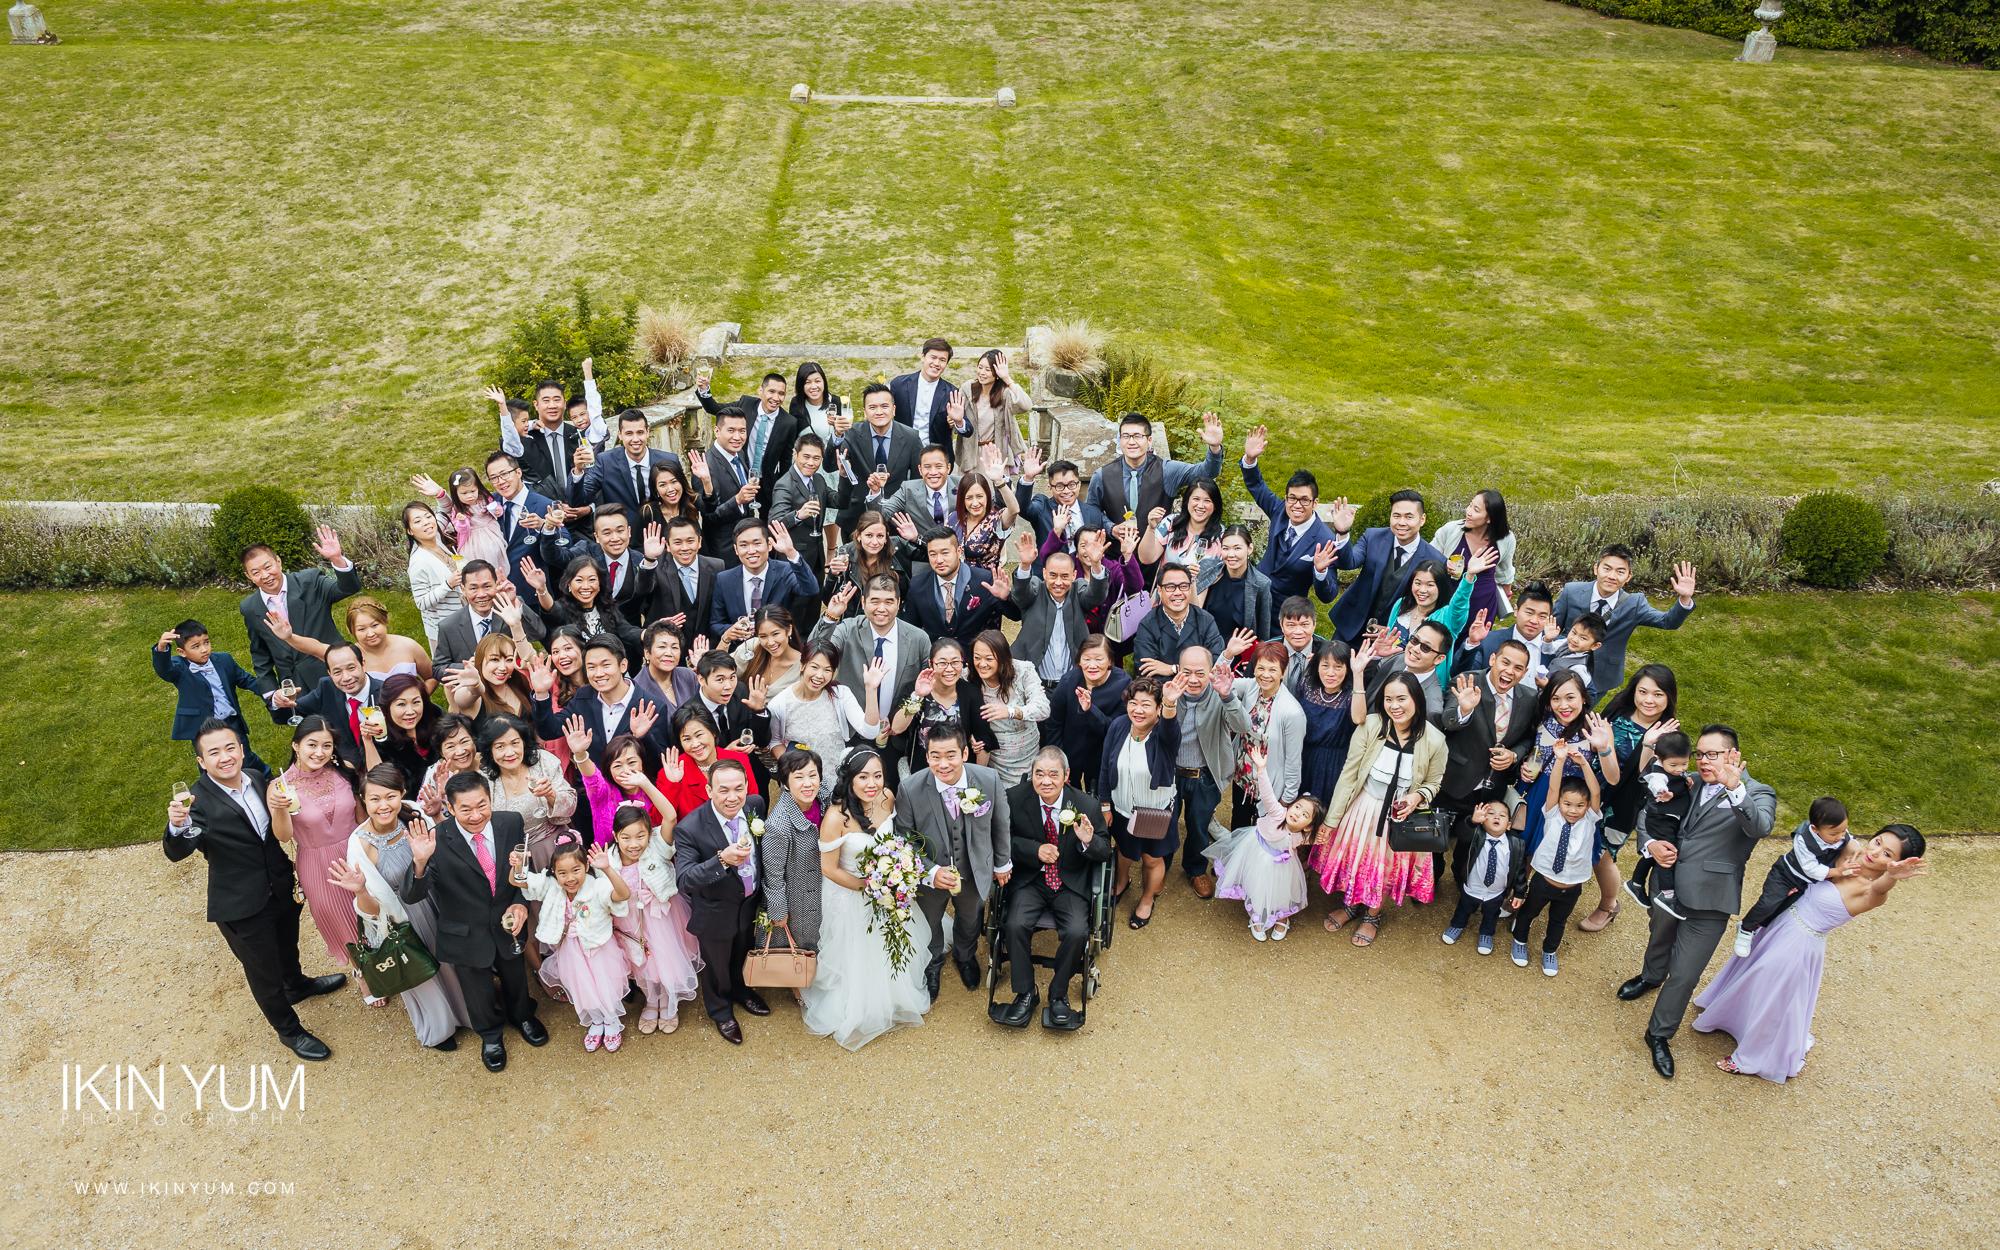 Hampton Manor Wedding - Ikin Yum Photography -096.jpg